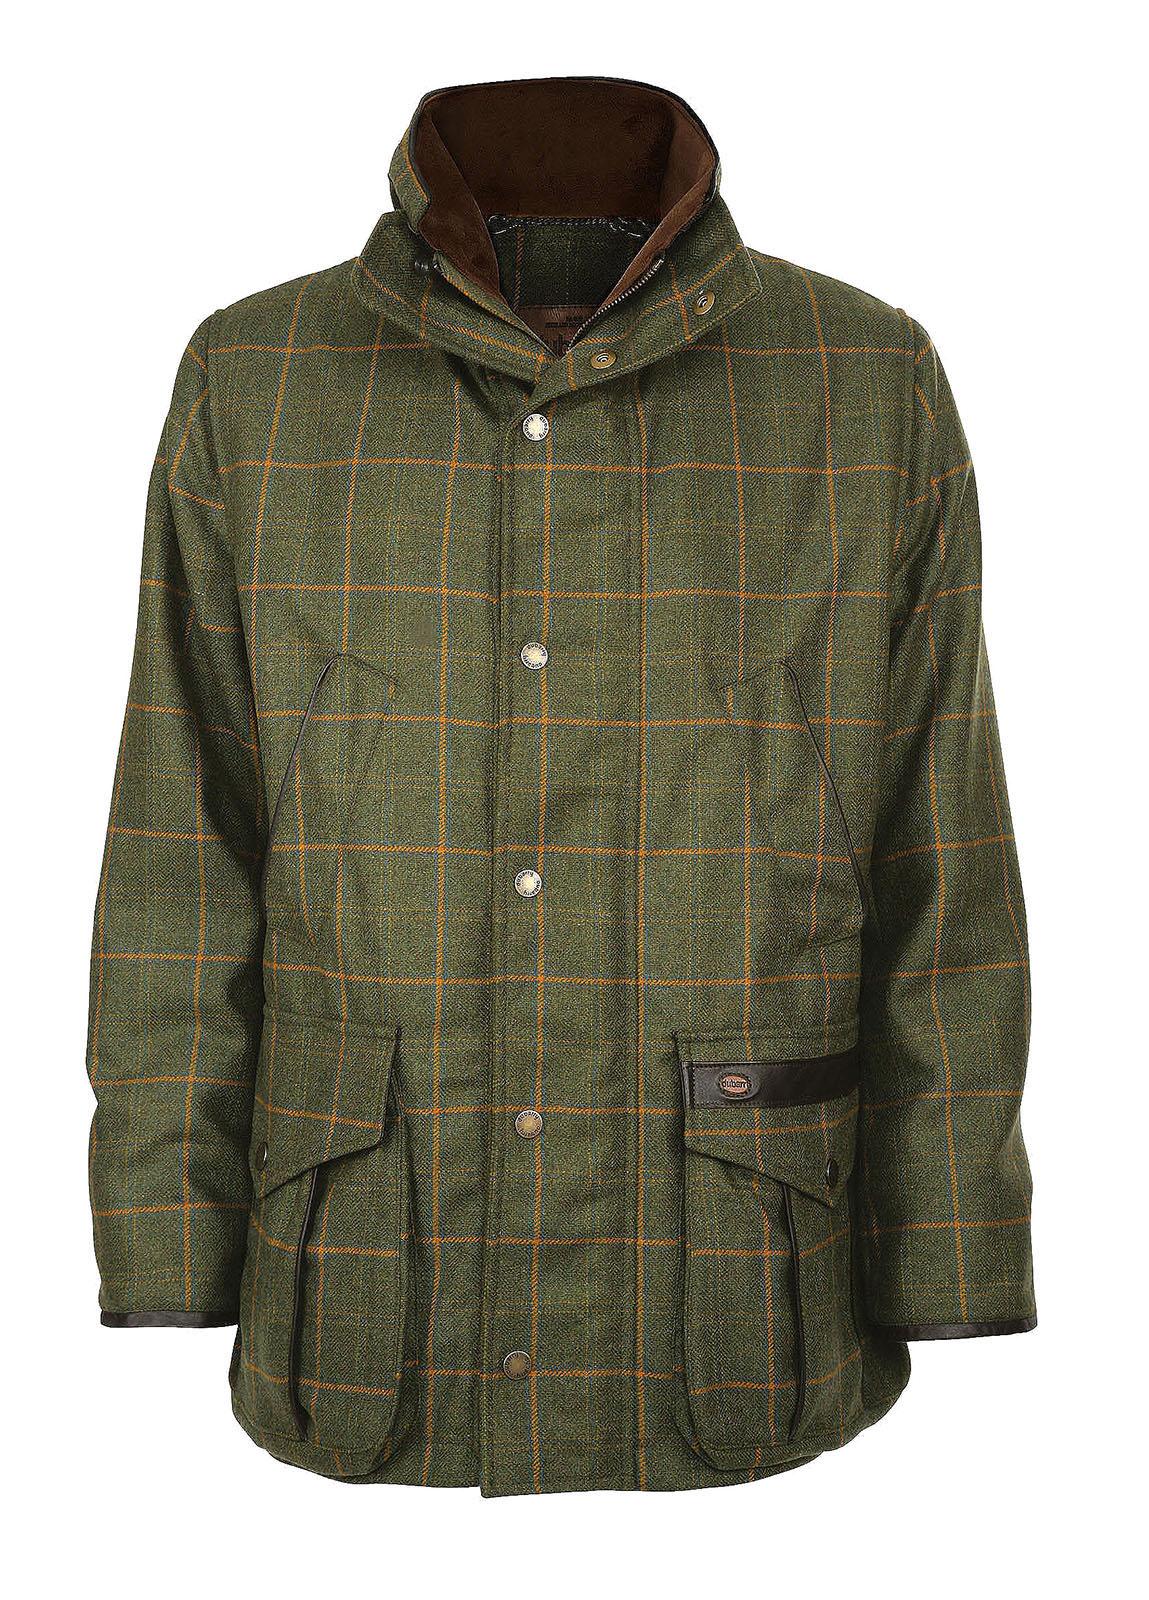 Dubarry_Ballyfin Tweed Jacket - Whiskey_Image_2